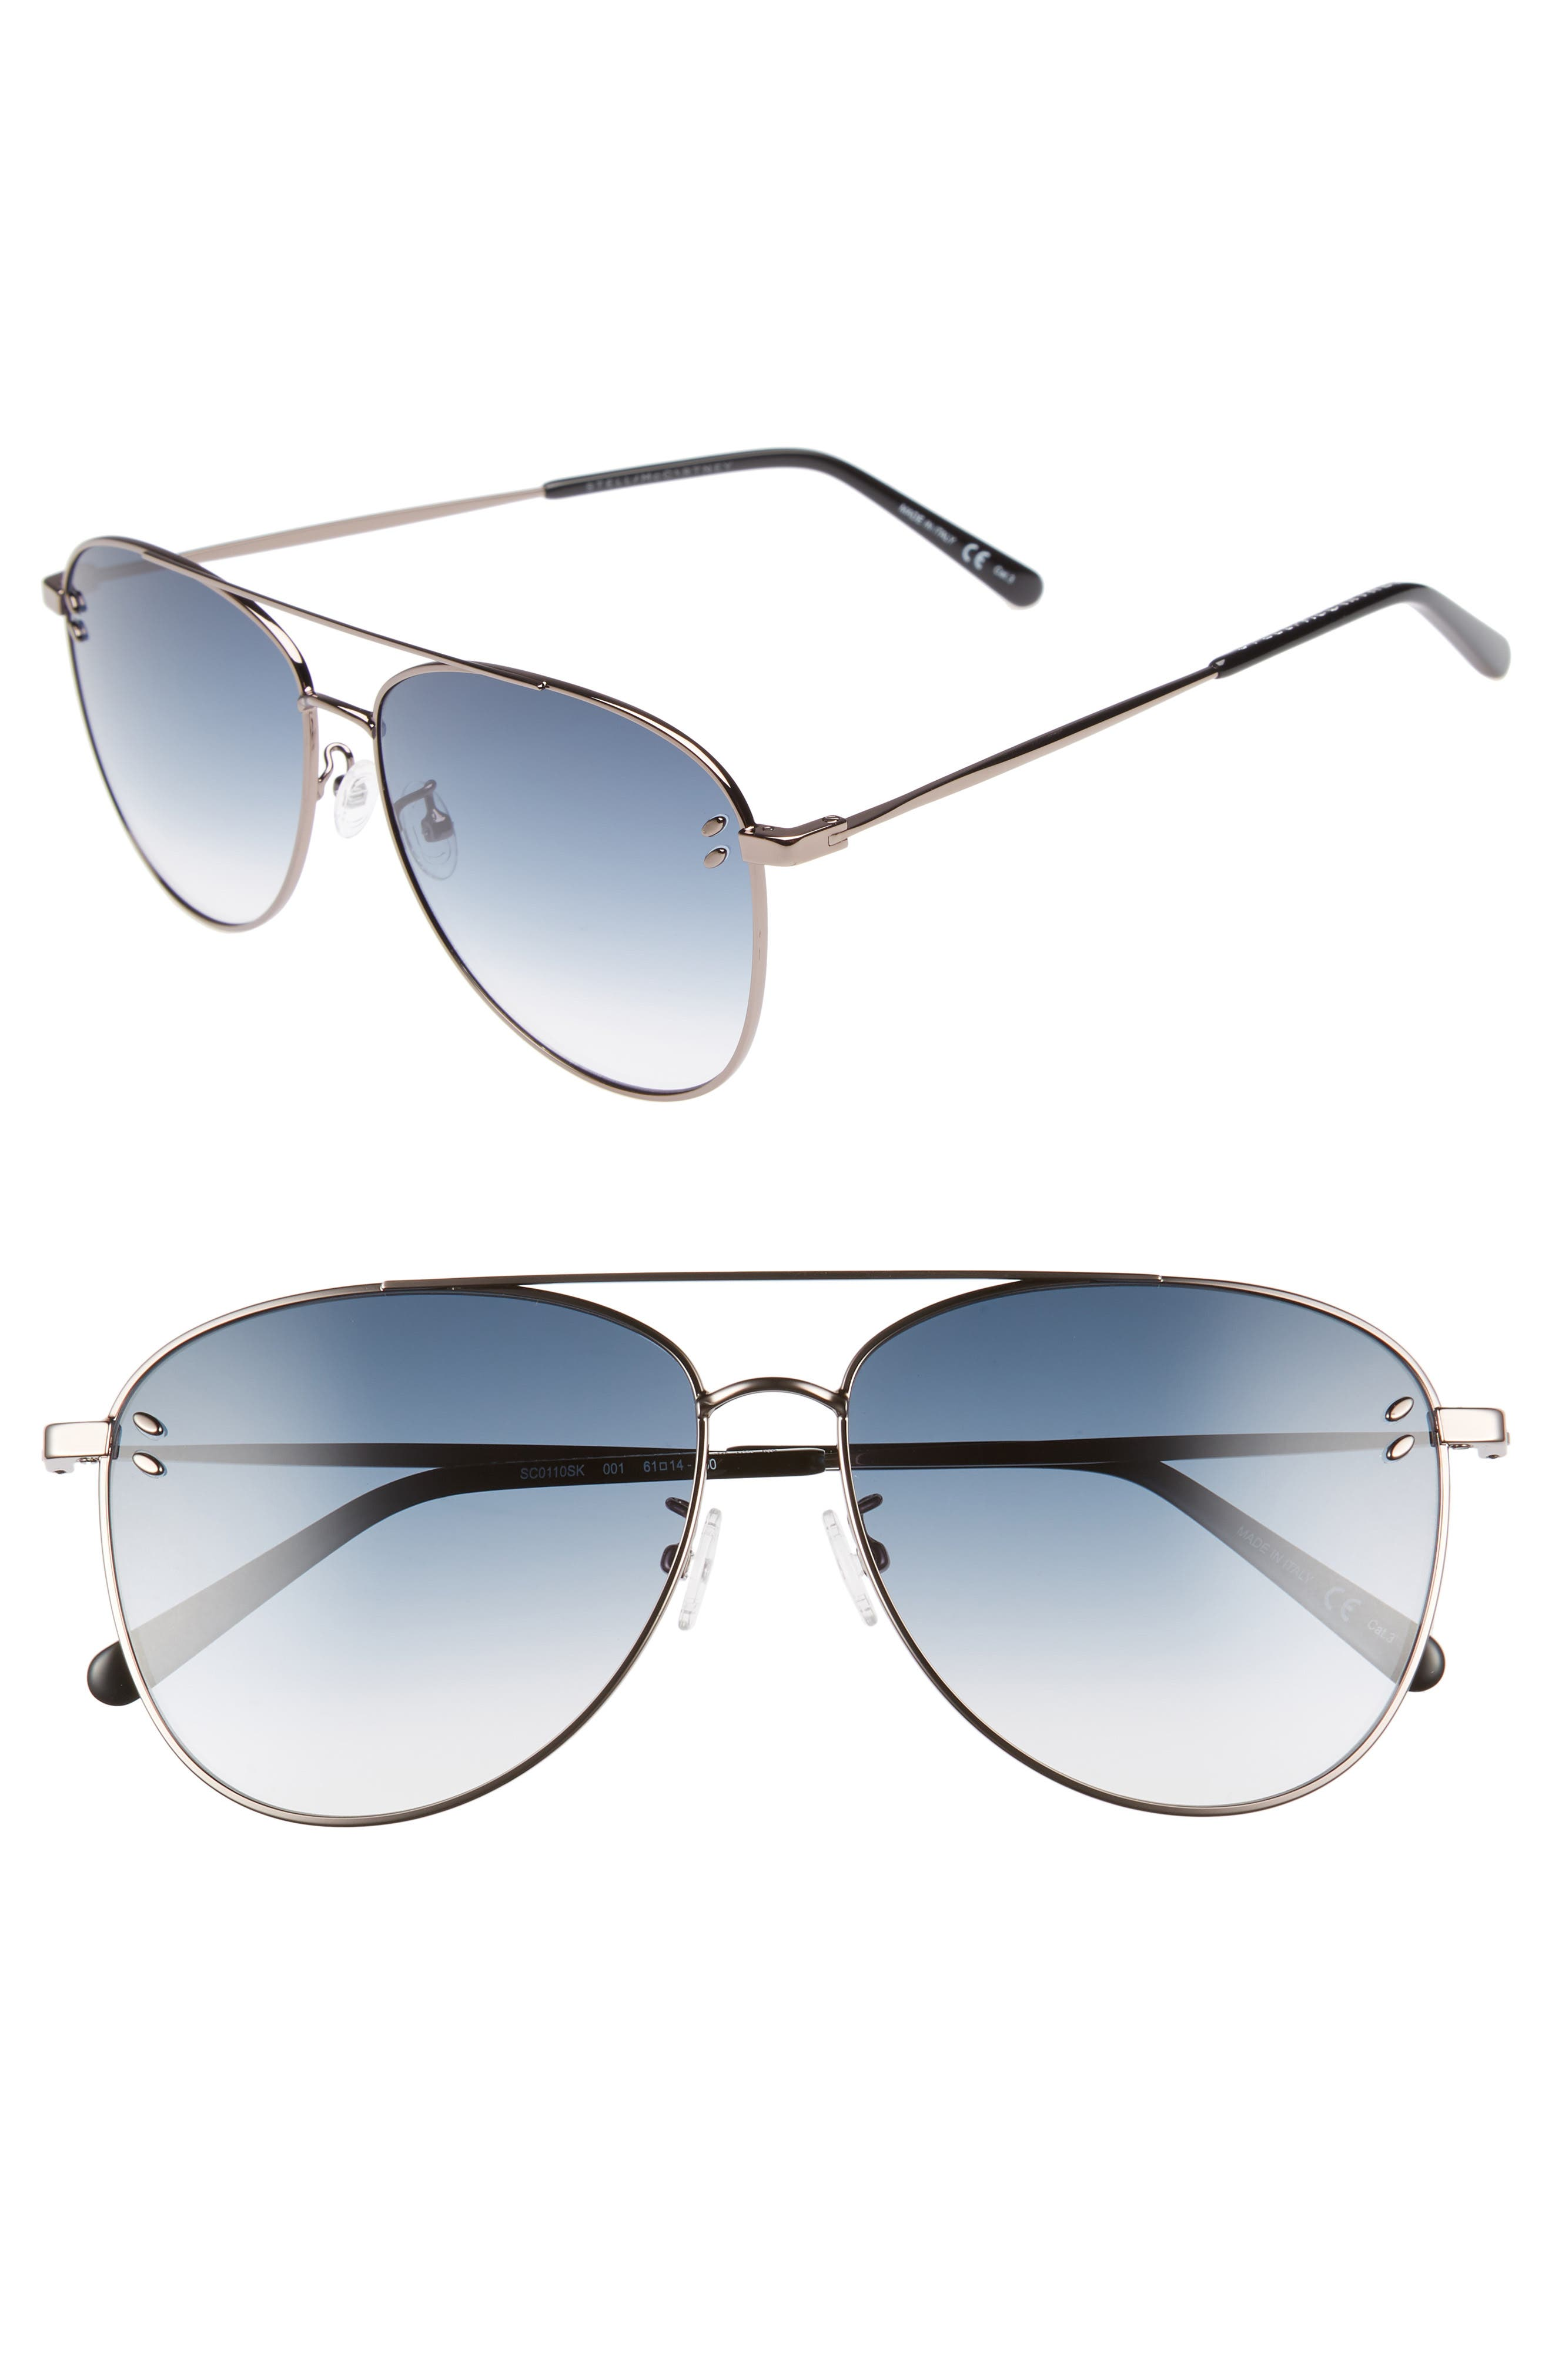 61mm Aviator Sunglasses,                             Main thumbnail 1, color,                             041